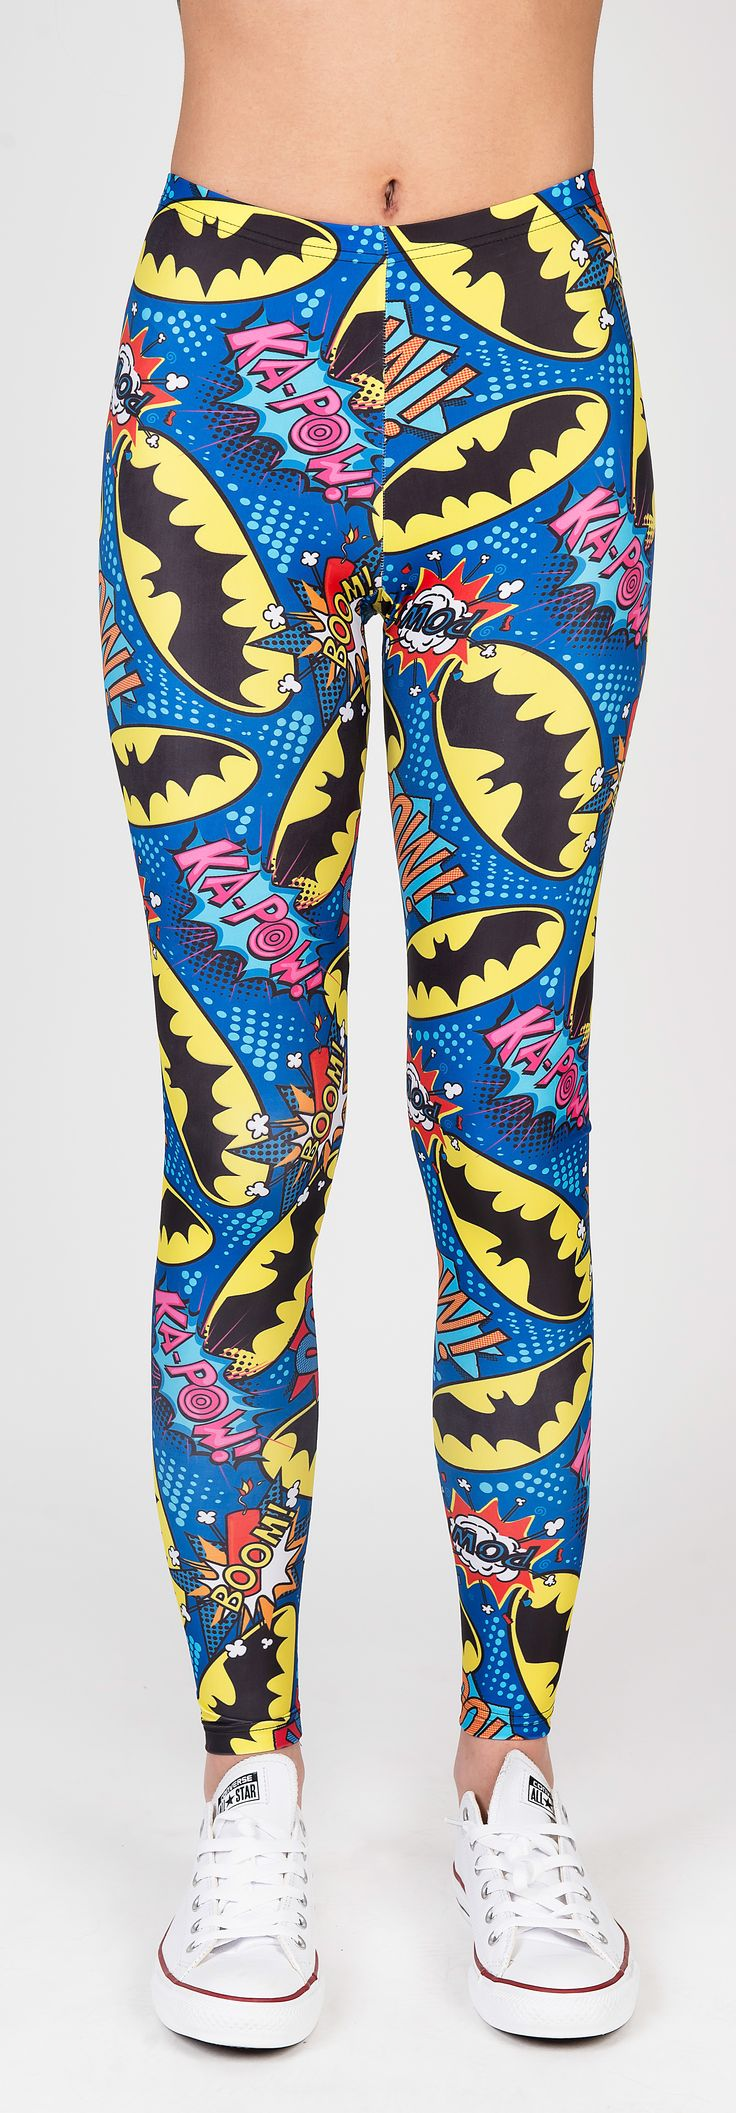 PCP Genesis - batman leggings